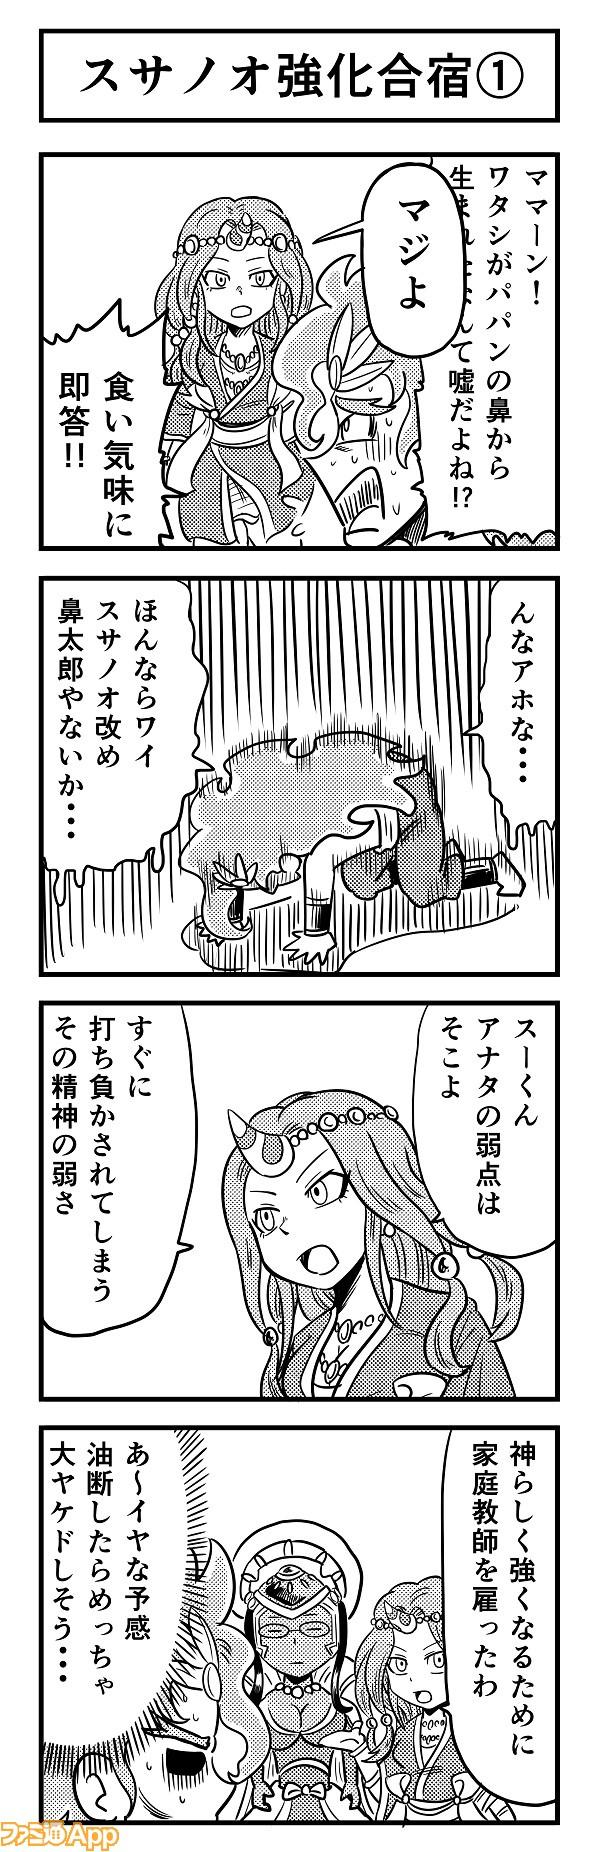 4koma511